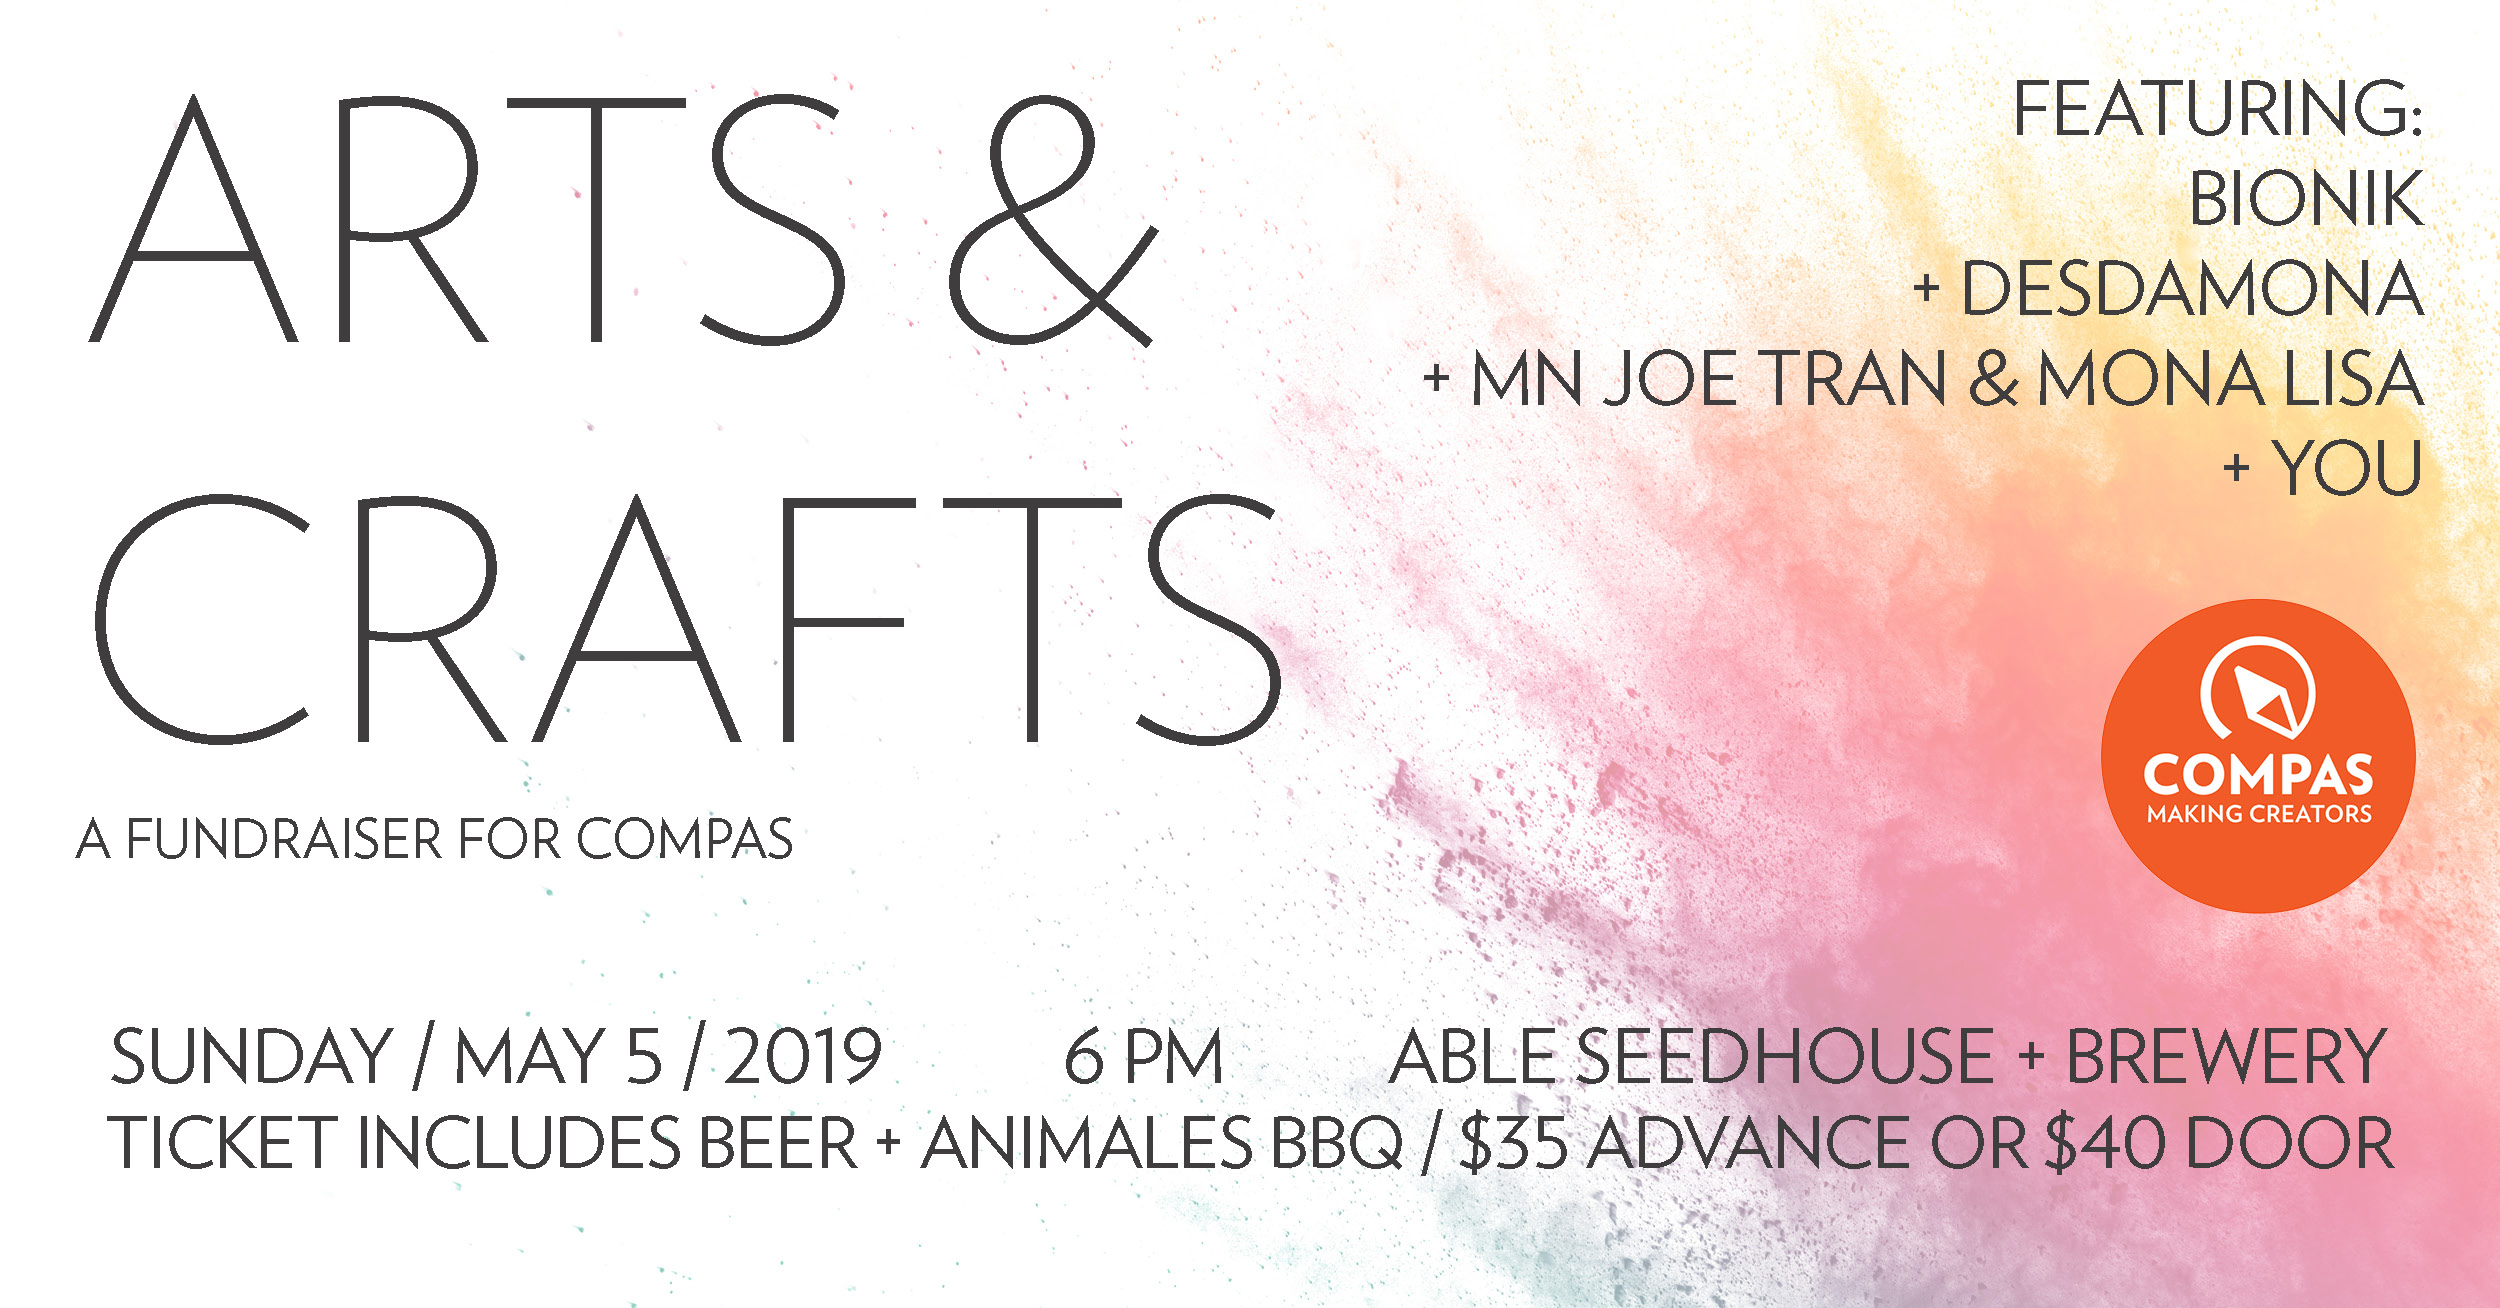 Arts & Crafts FB Ad.jpg